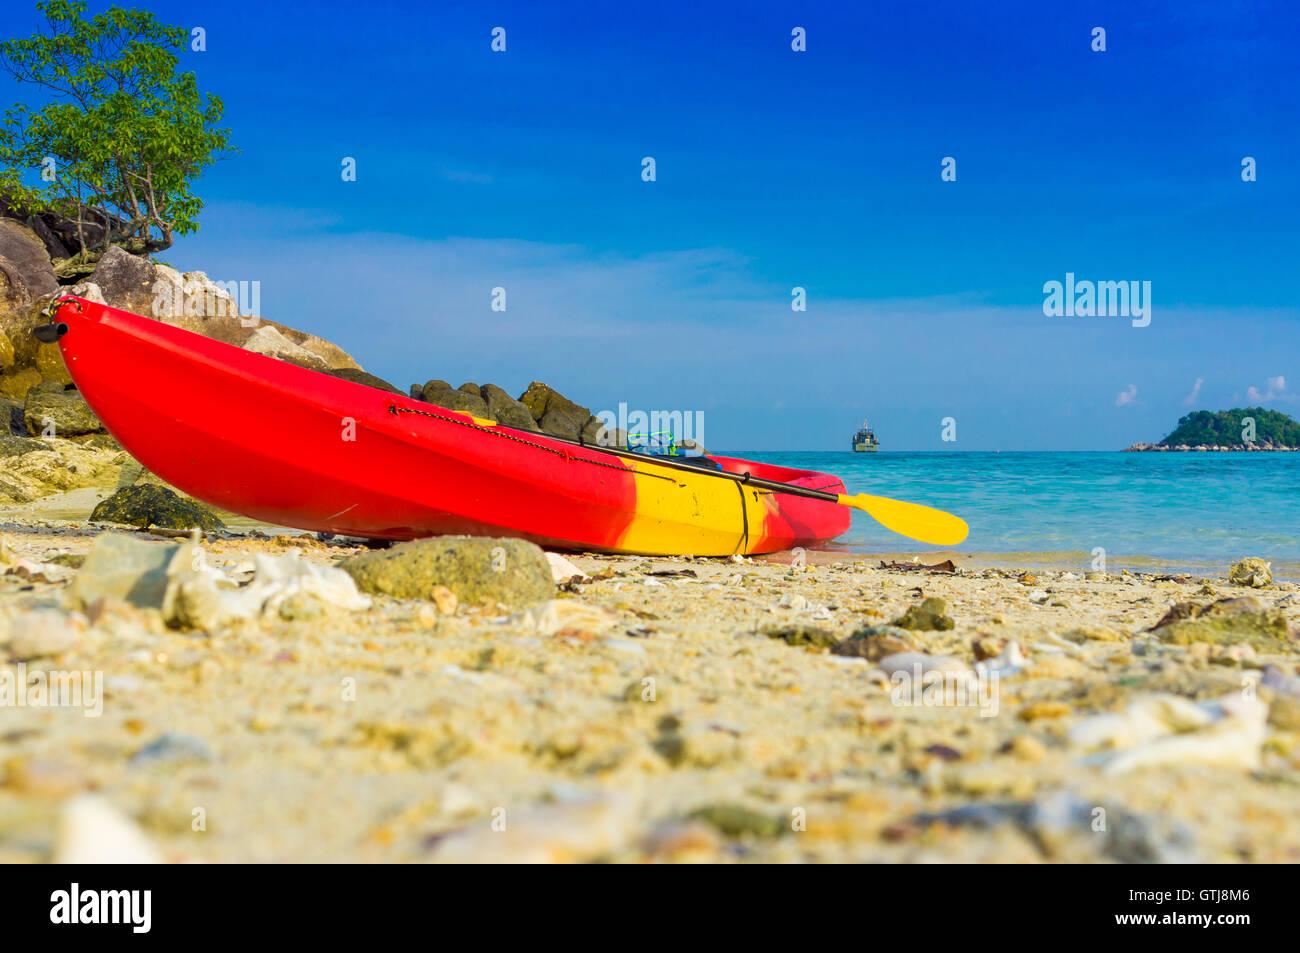 Red yellow kayaks on the tropical beach, Lipe island, Thailand - Stock Image